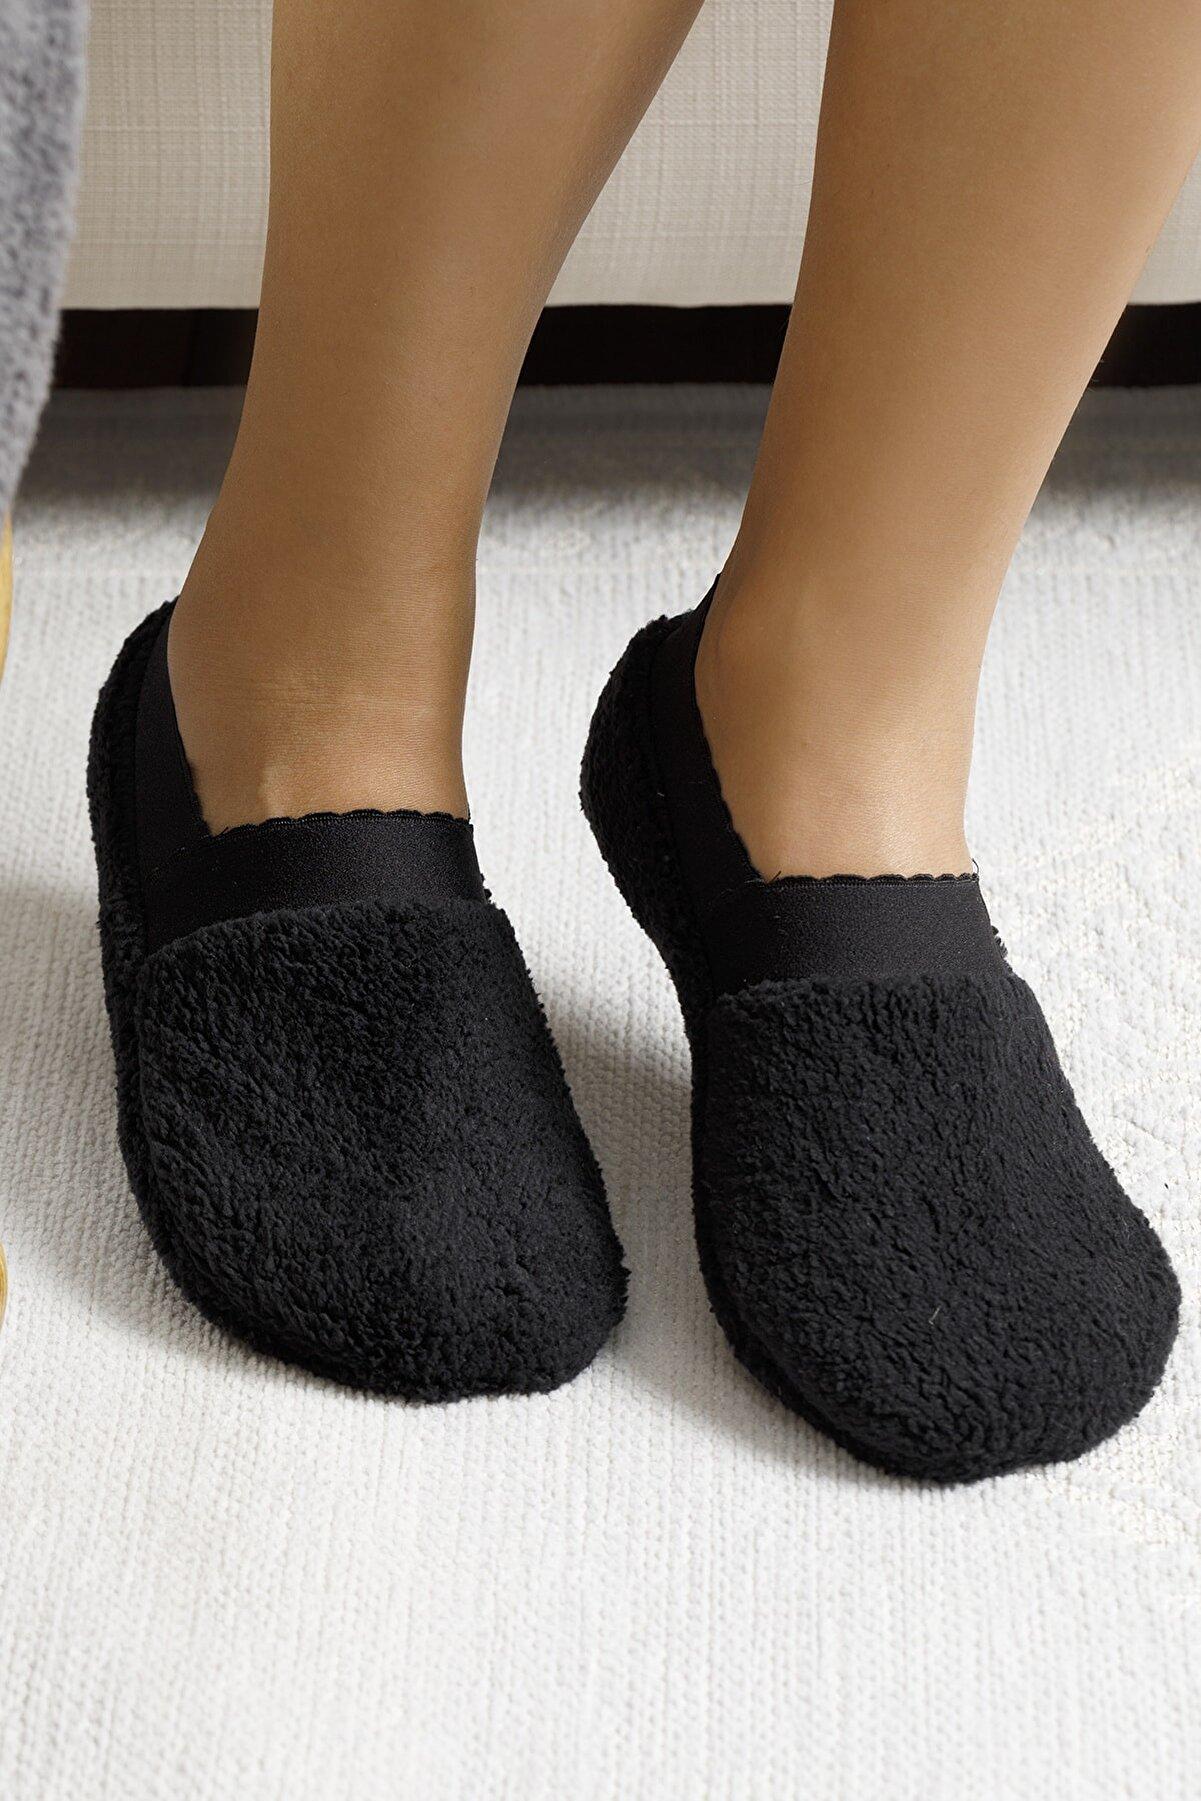 English Home New Soft Kadın Çorap Siyah